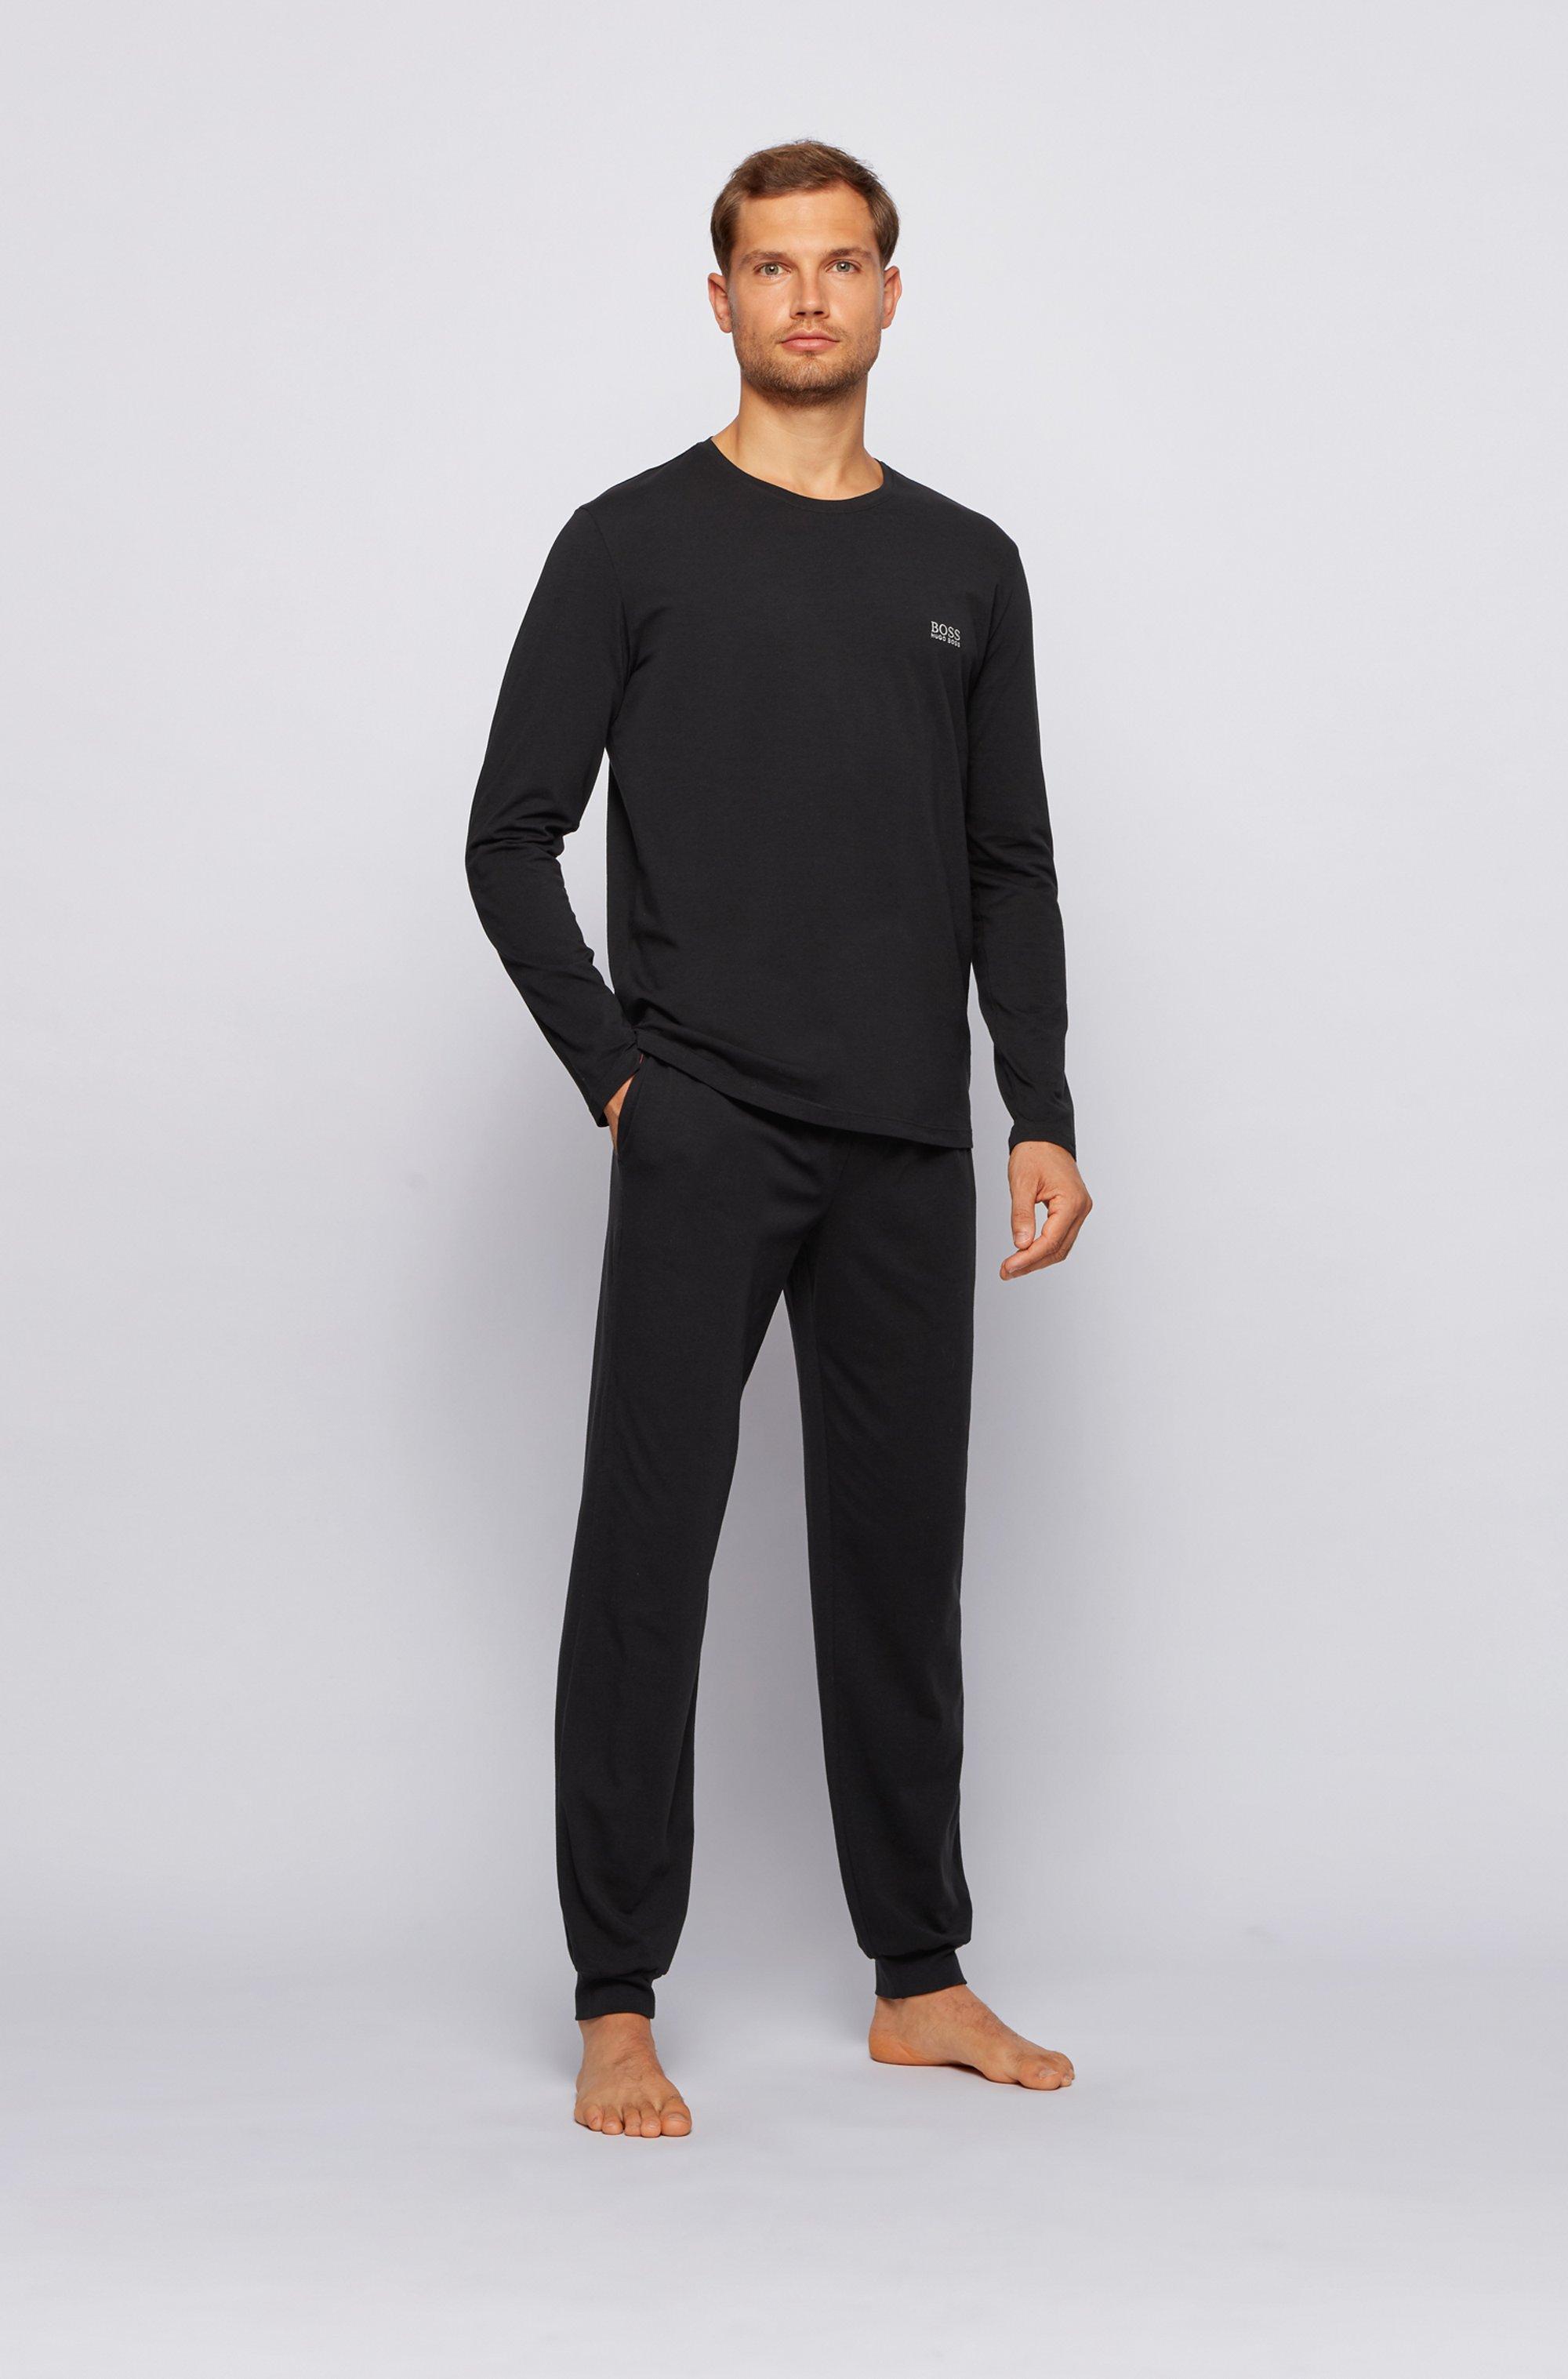 Regular-fit loungewear top in stretch cotton jersey